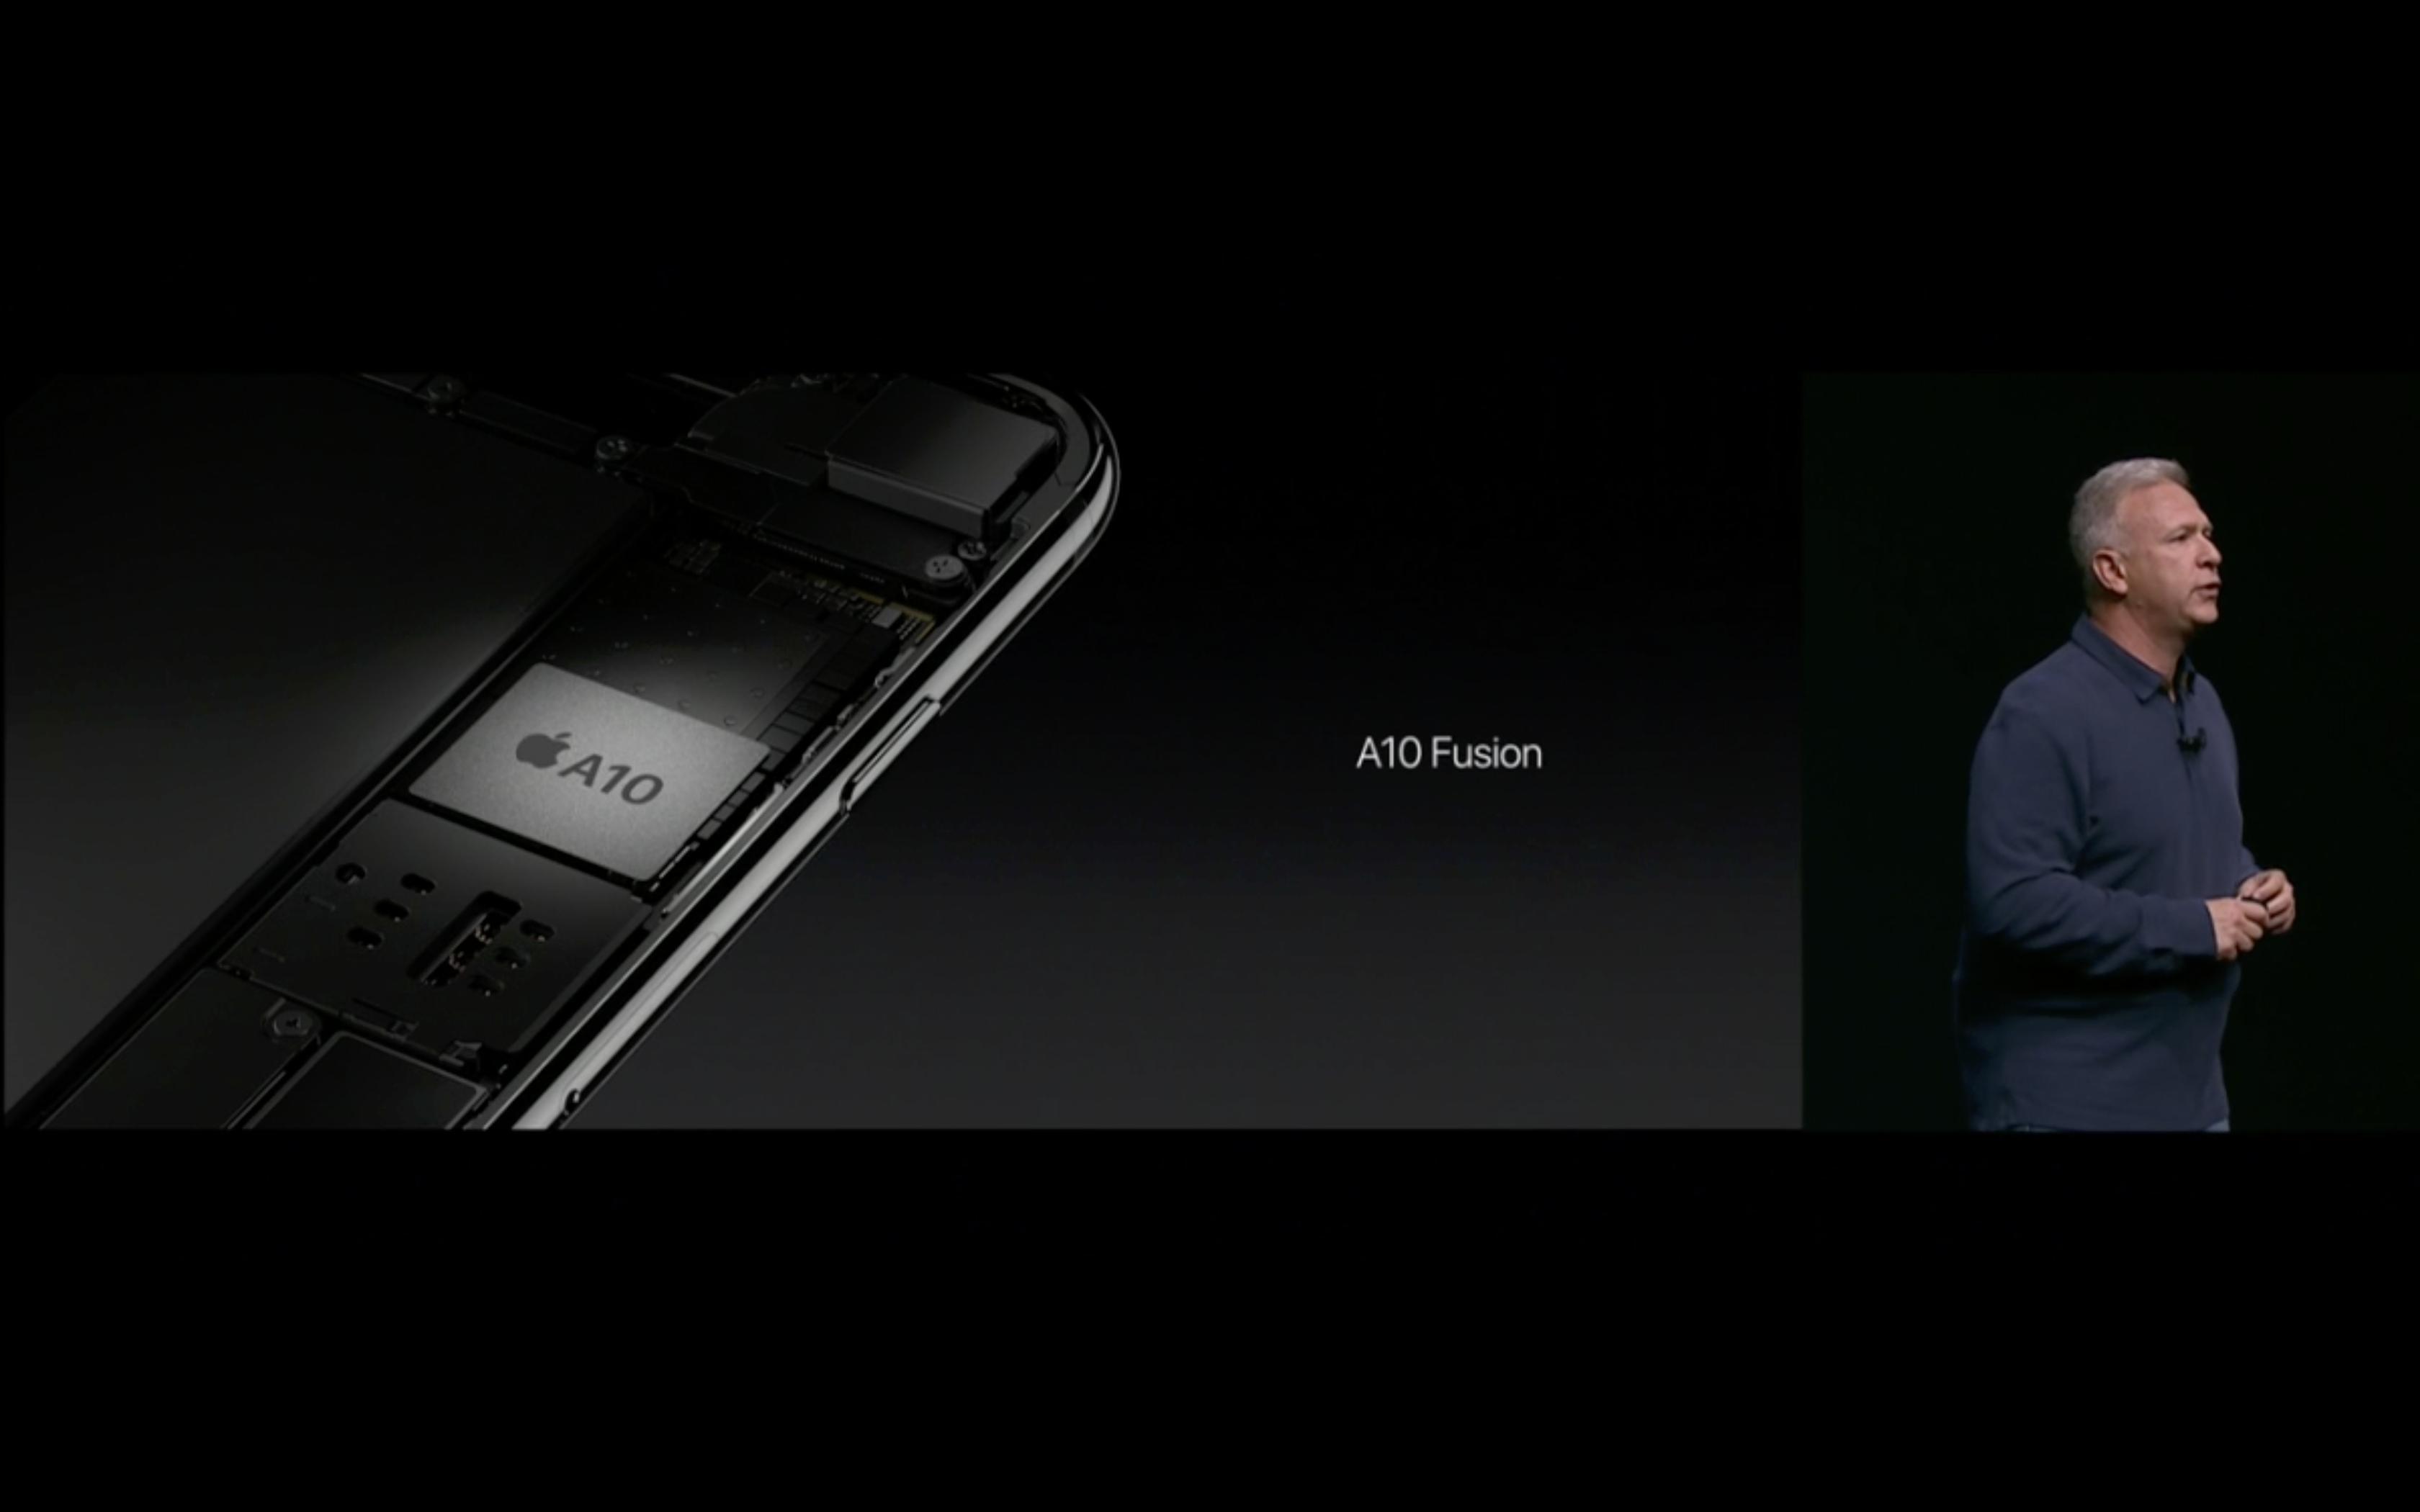 iPhone 7 Geräusche